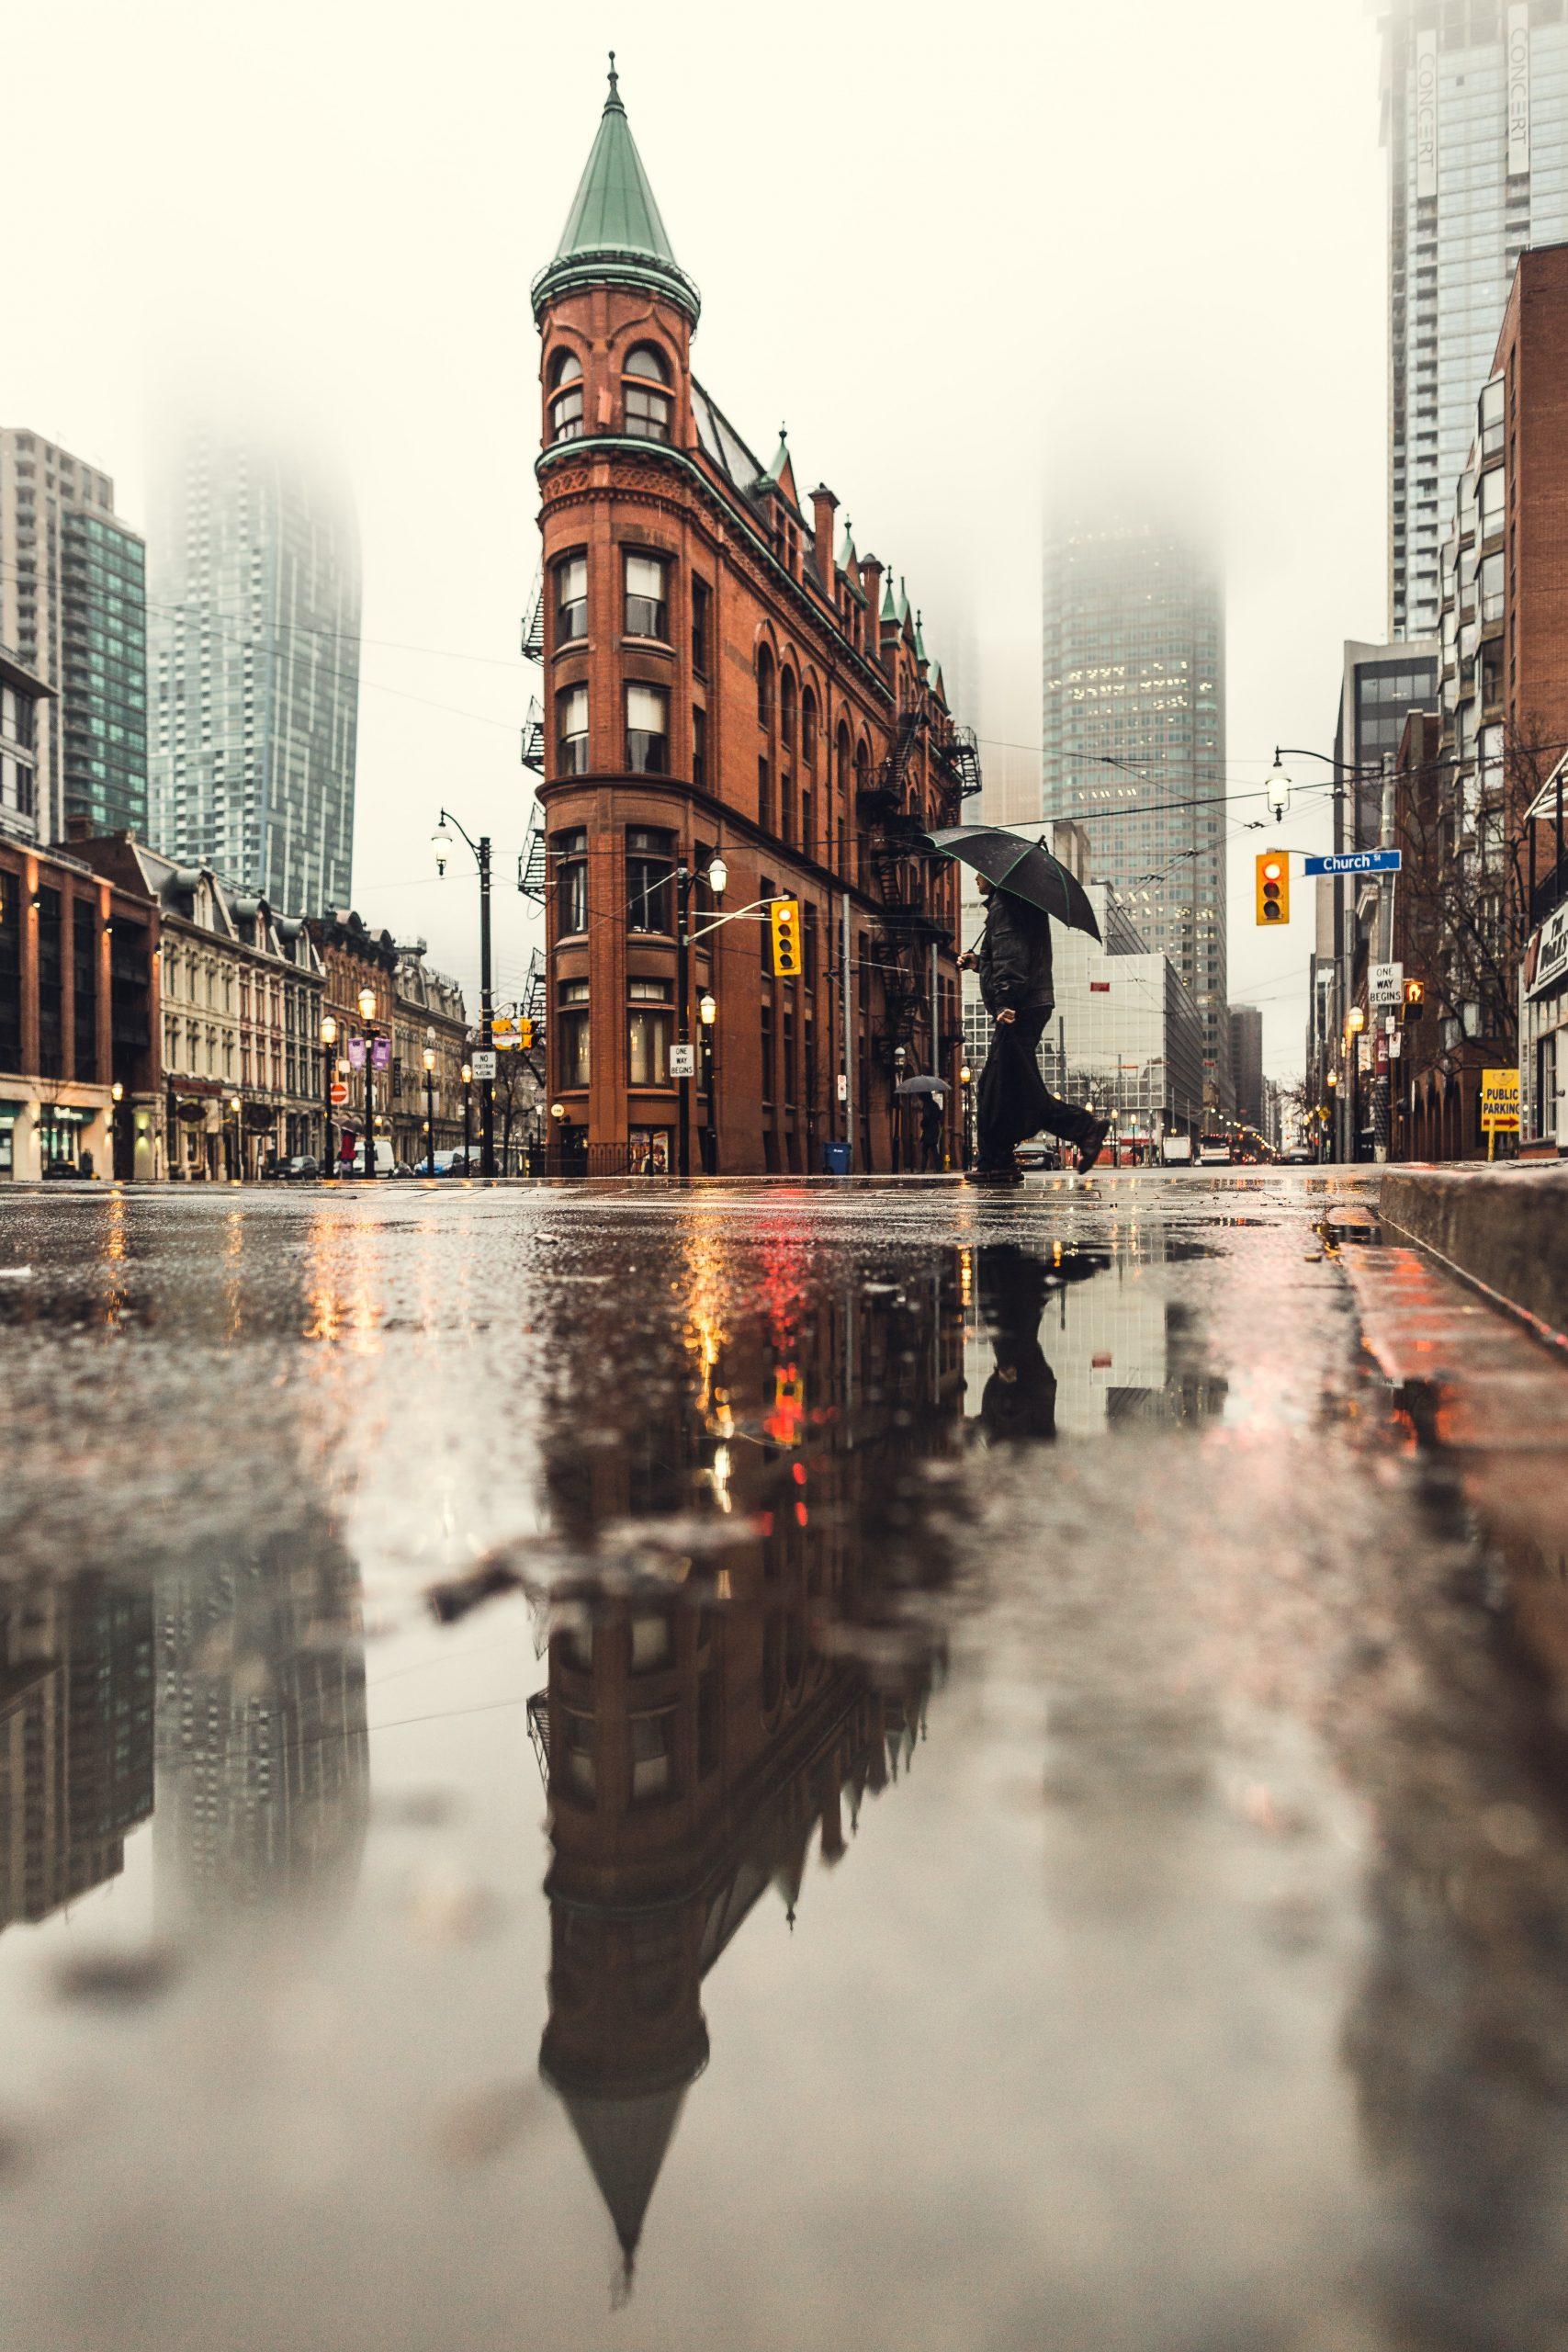 Rainy Day by Matthew Henry